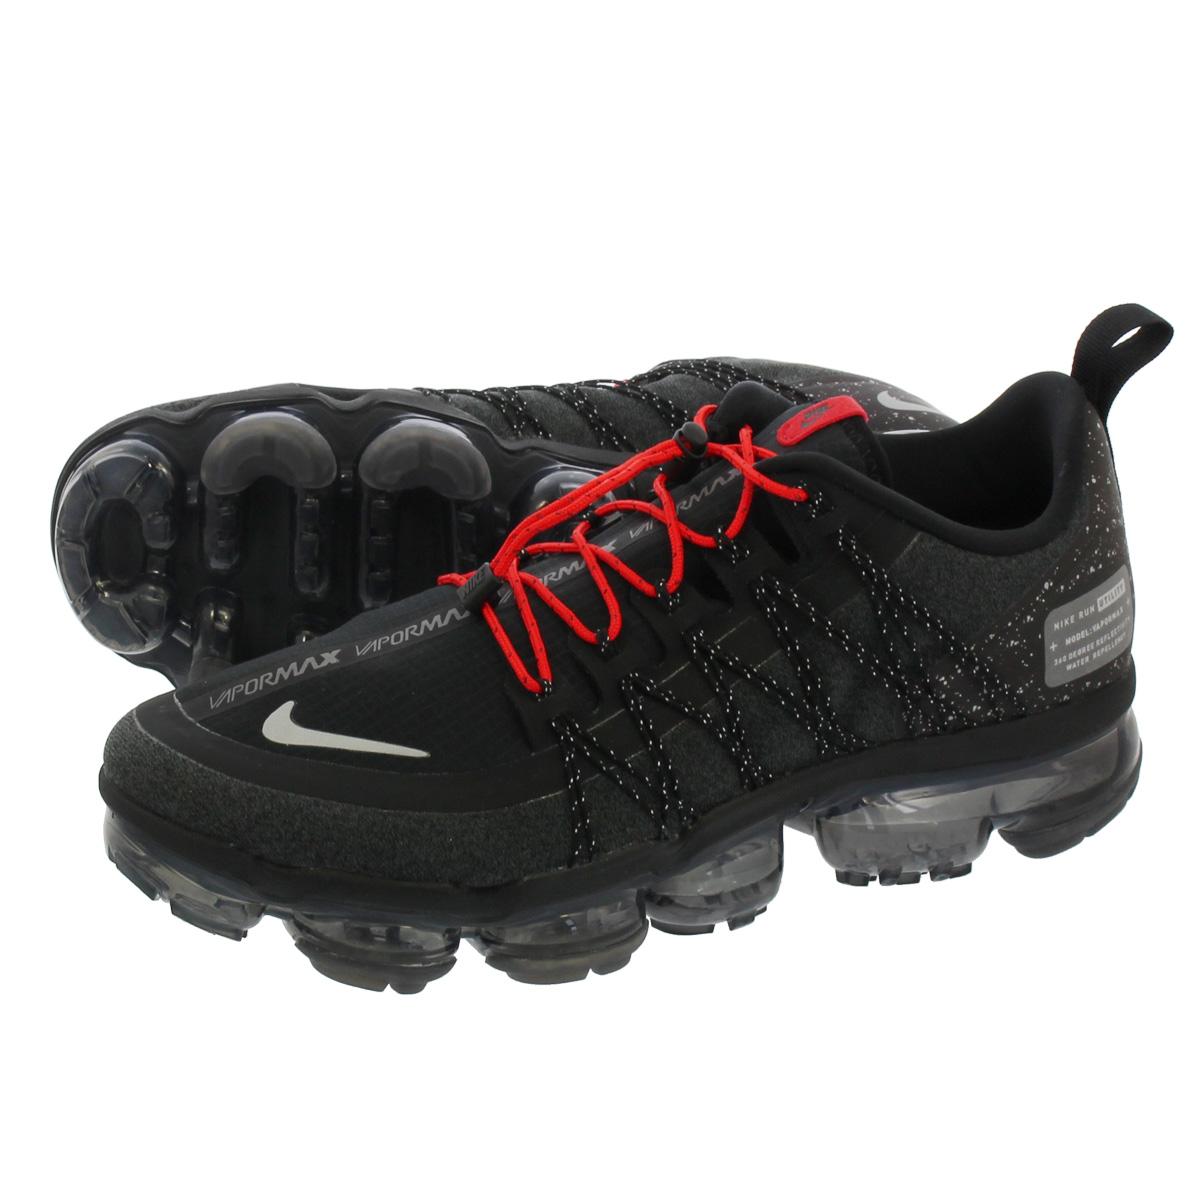 Nike Air VaporMax Plus & Air VaporMax Utility Aflamico in